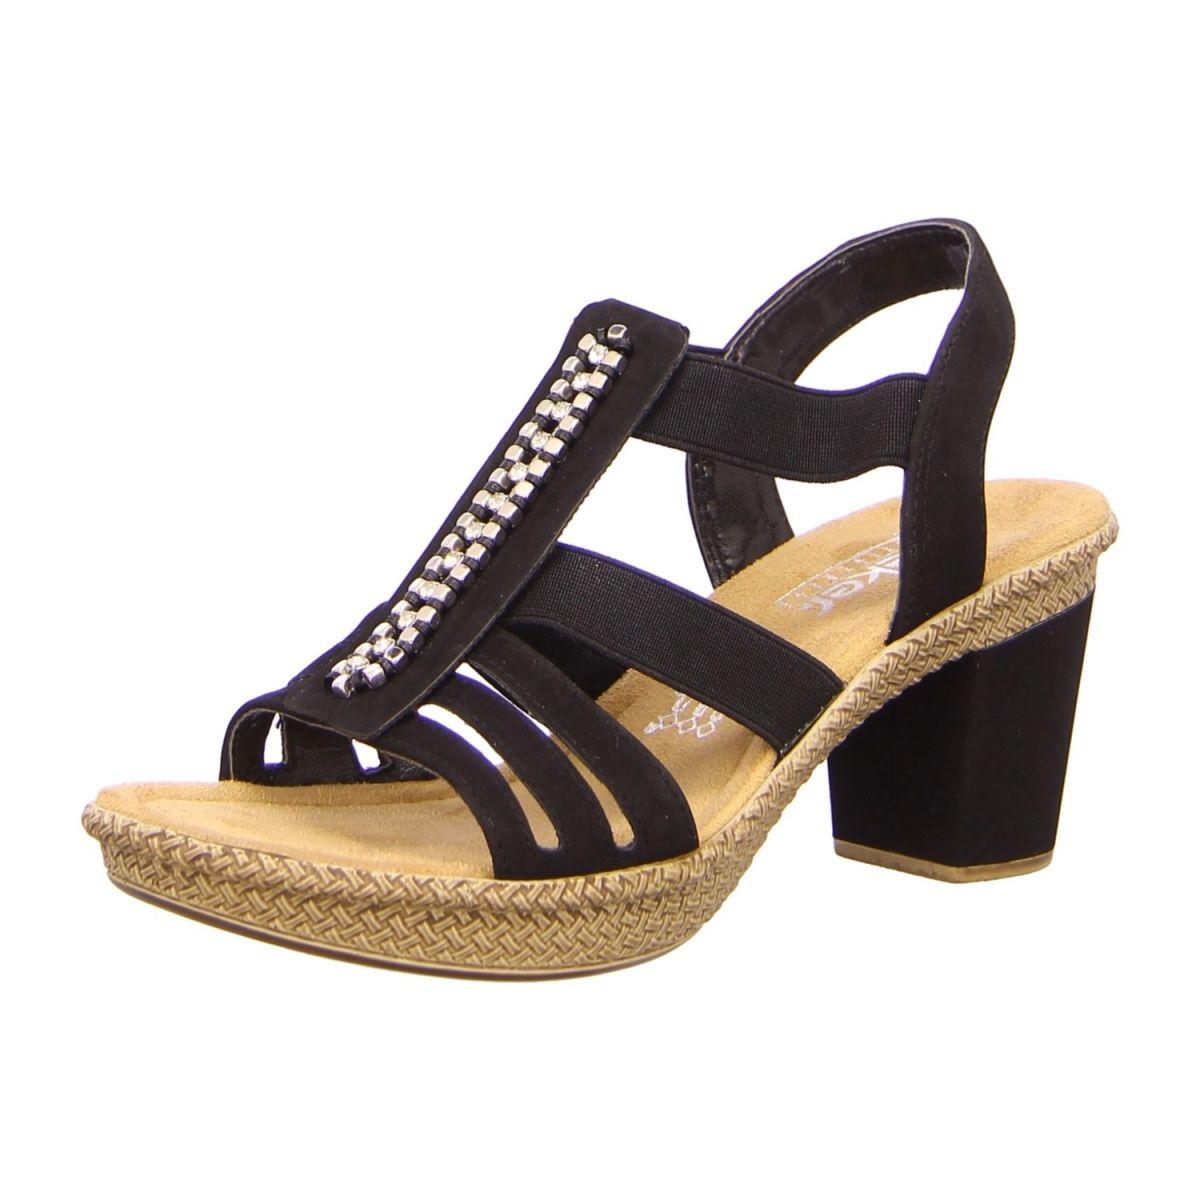 NEU: Rieker Sandaletten 66584 00 schwarz | Schuhe